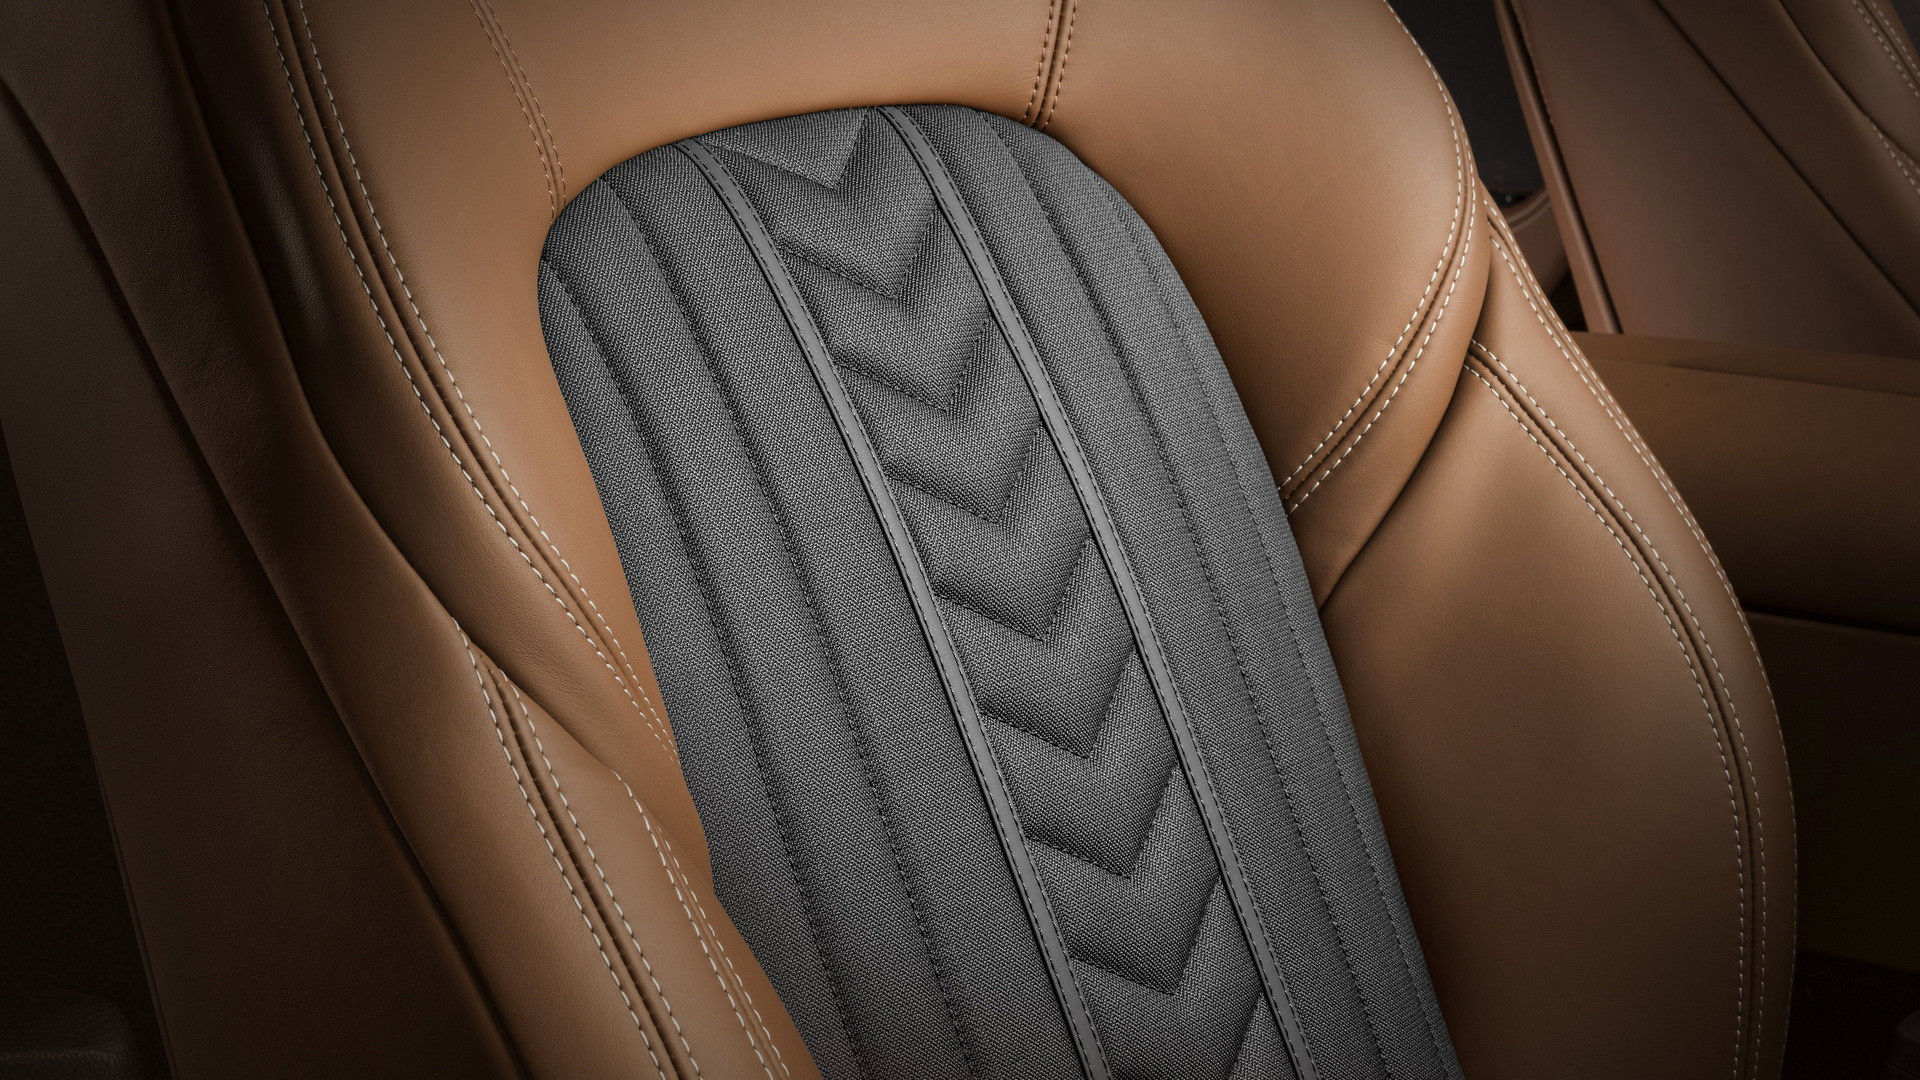 Maserati Gran Lusso - Ledersitze - Design